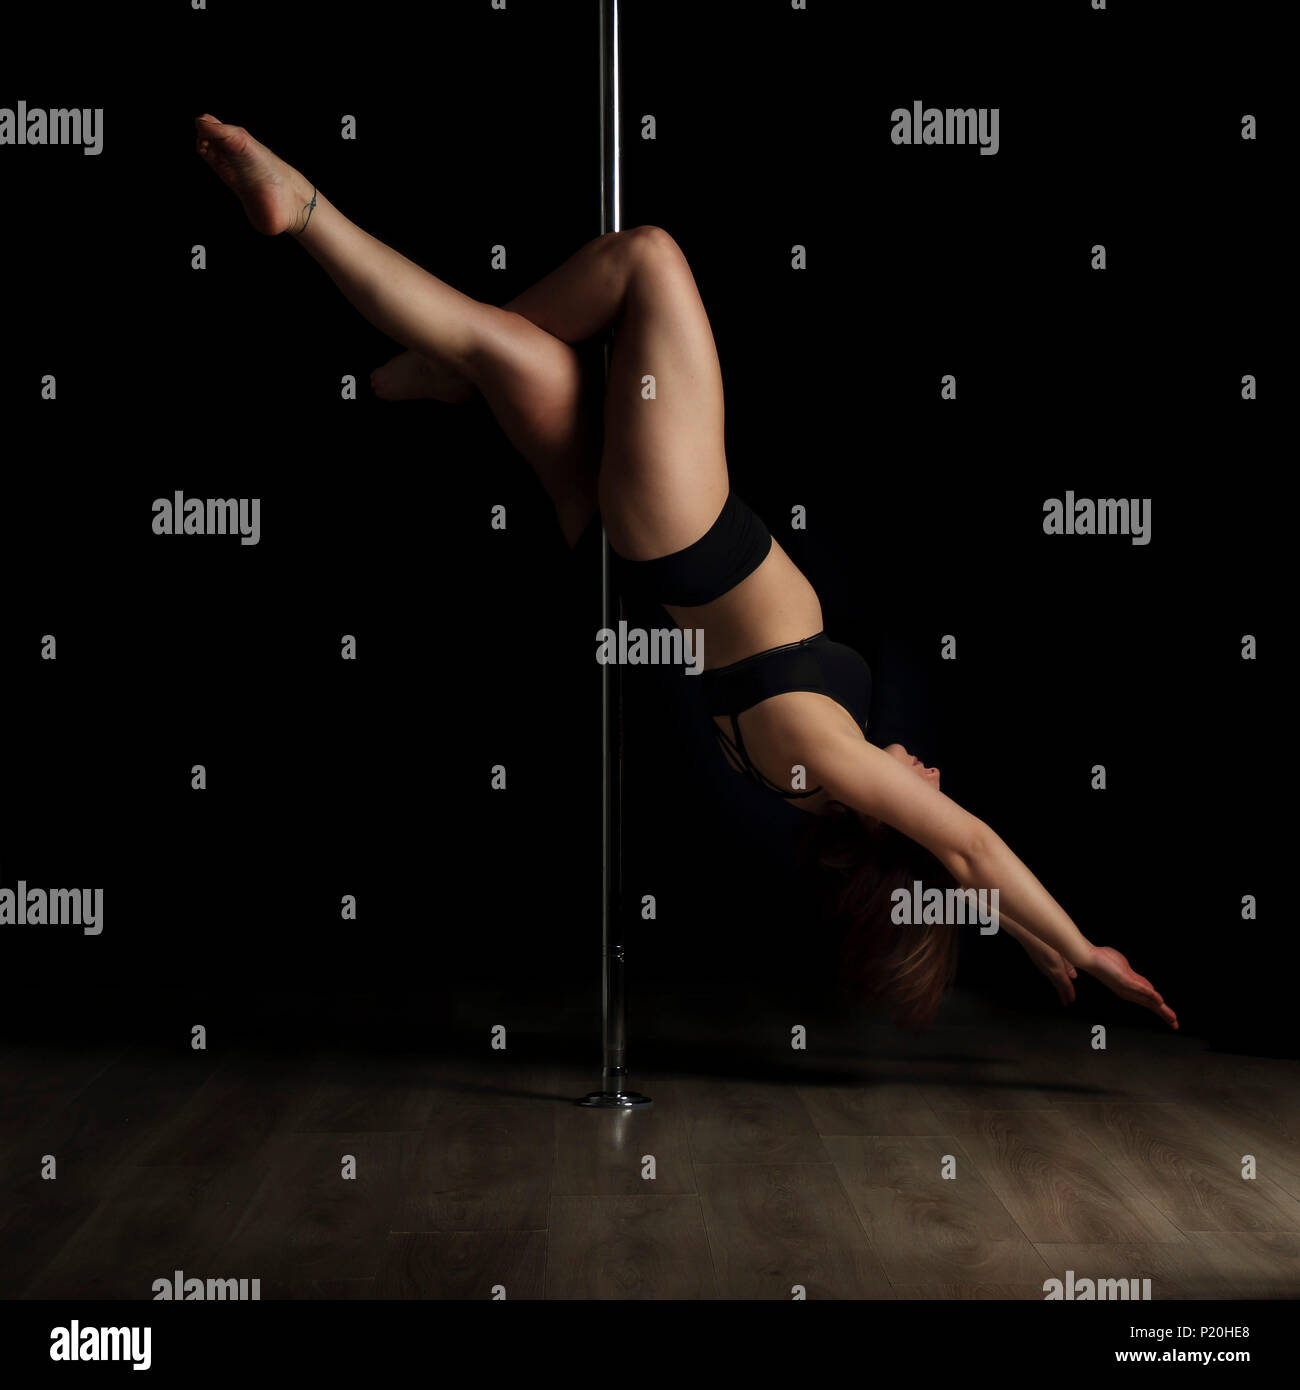 Pole dance - Stock Image